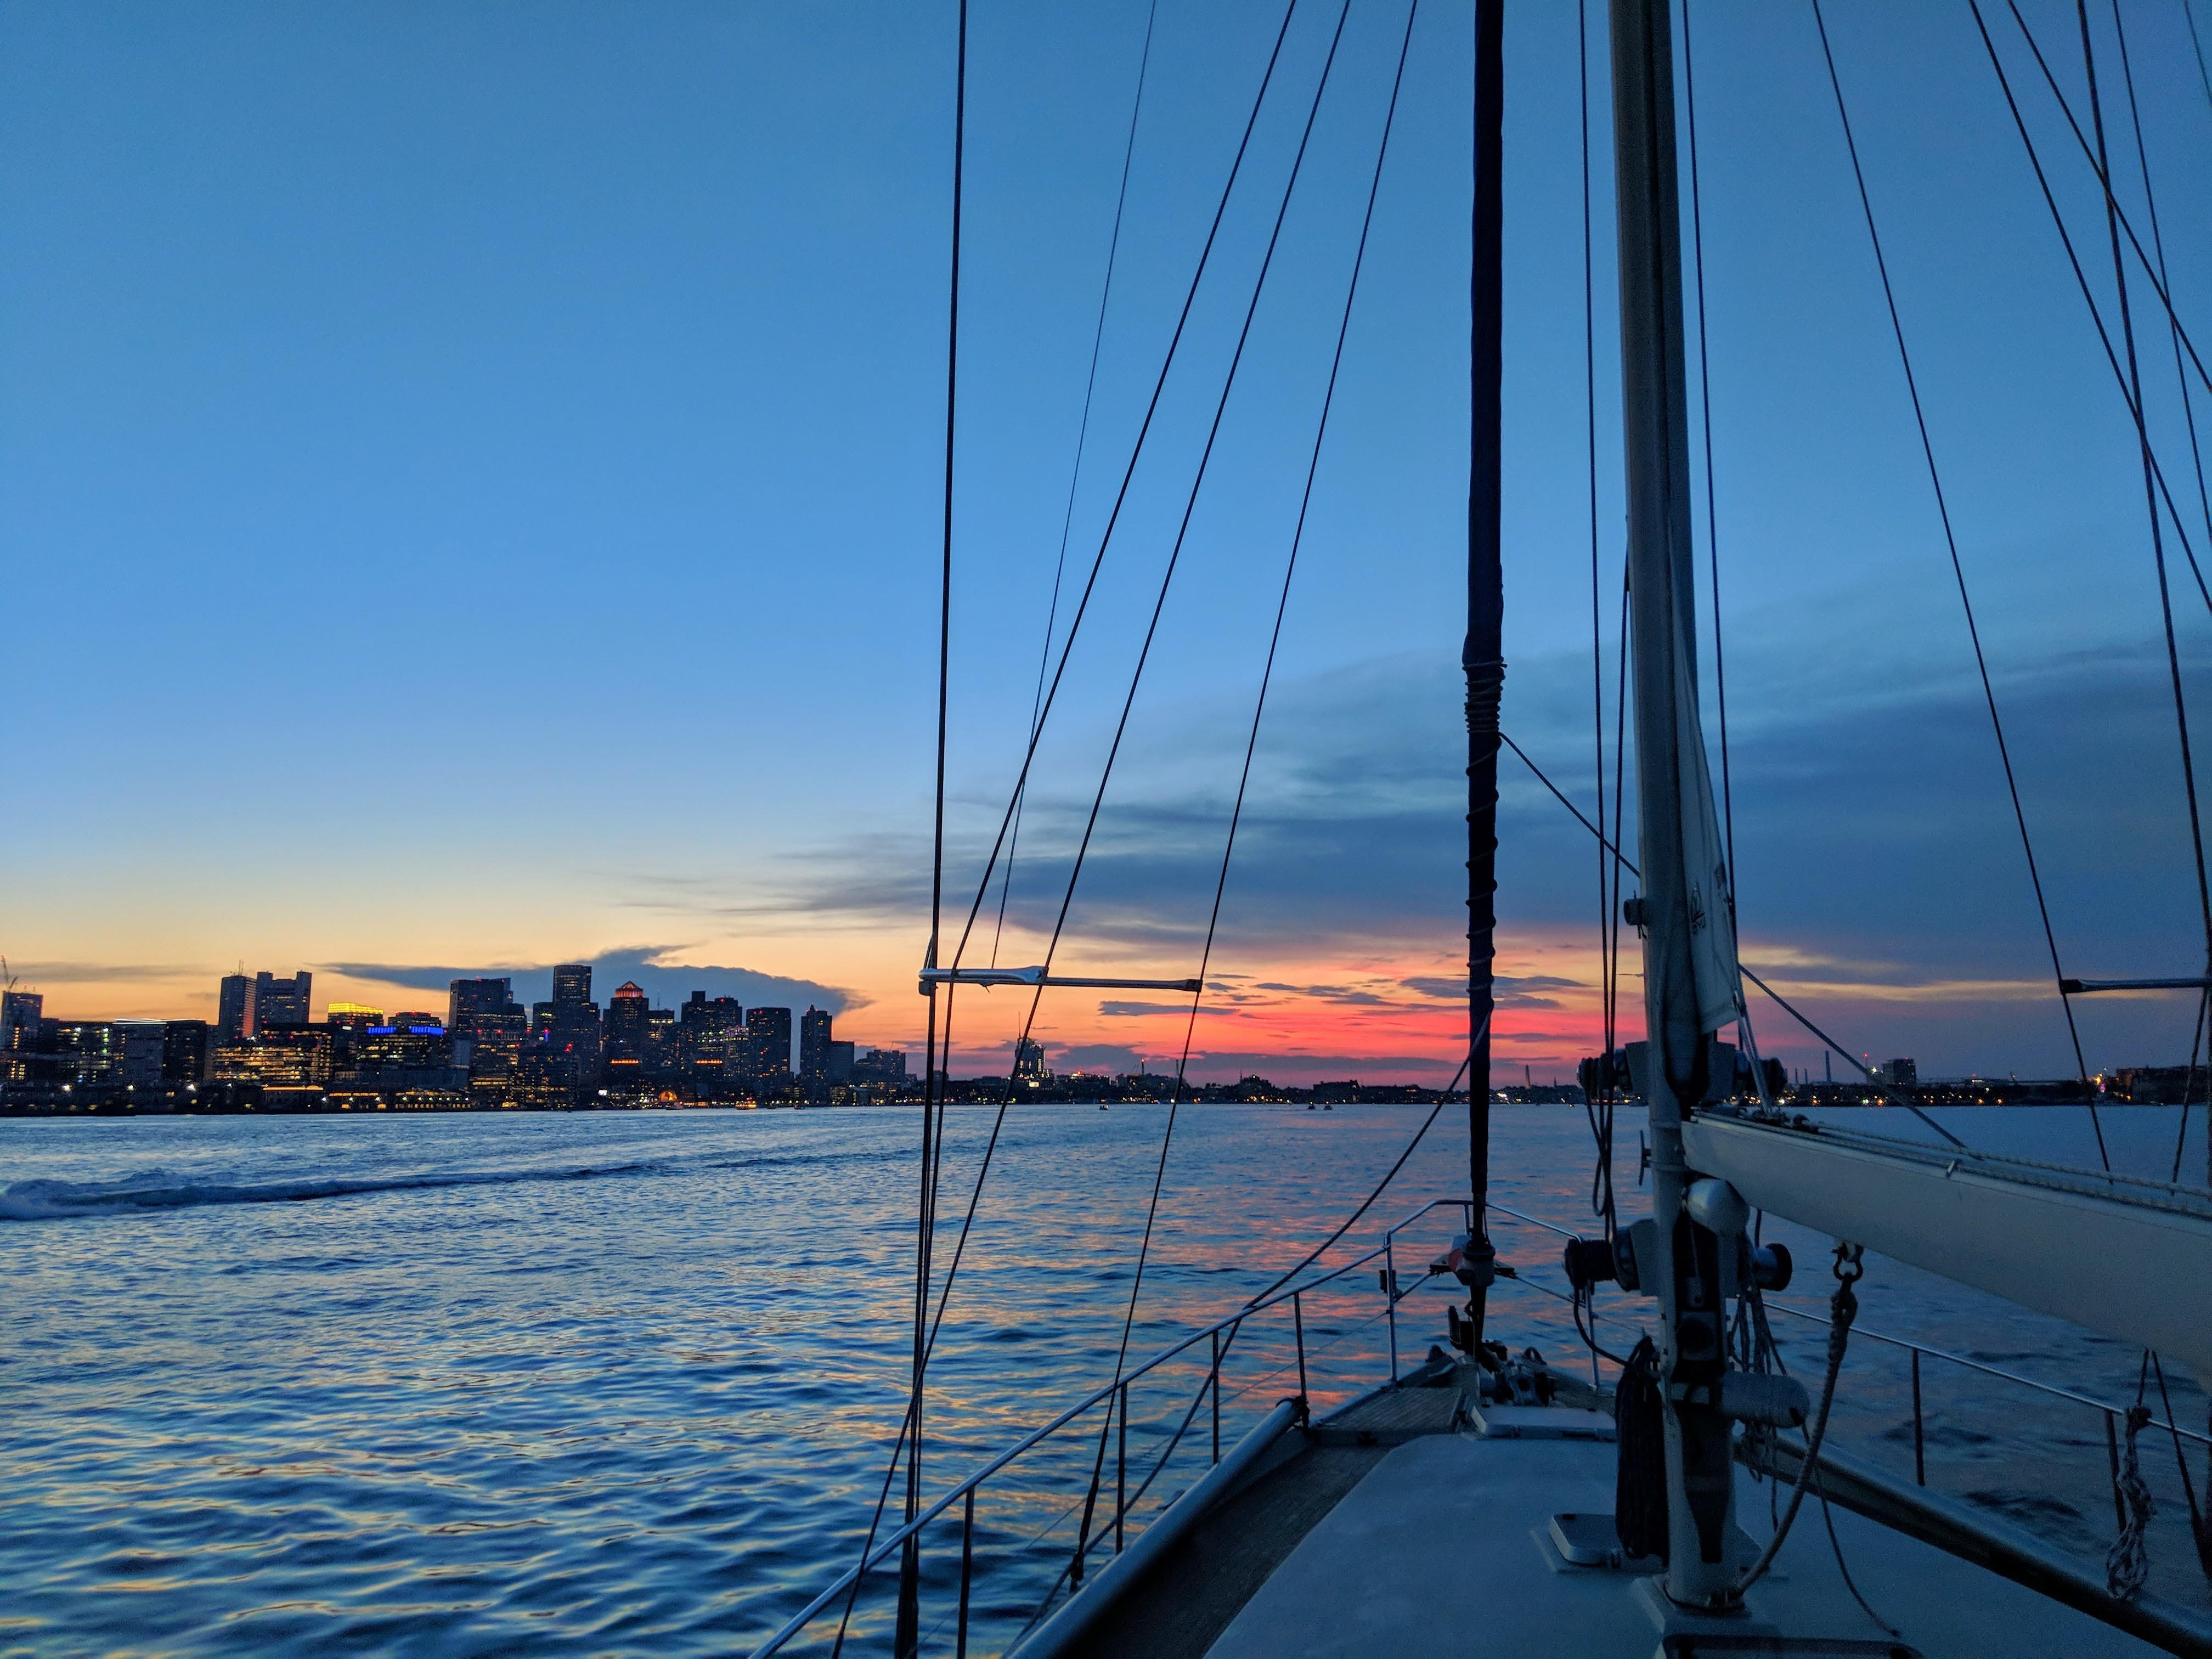 A sailboat approaching Boston at sunset